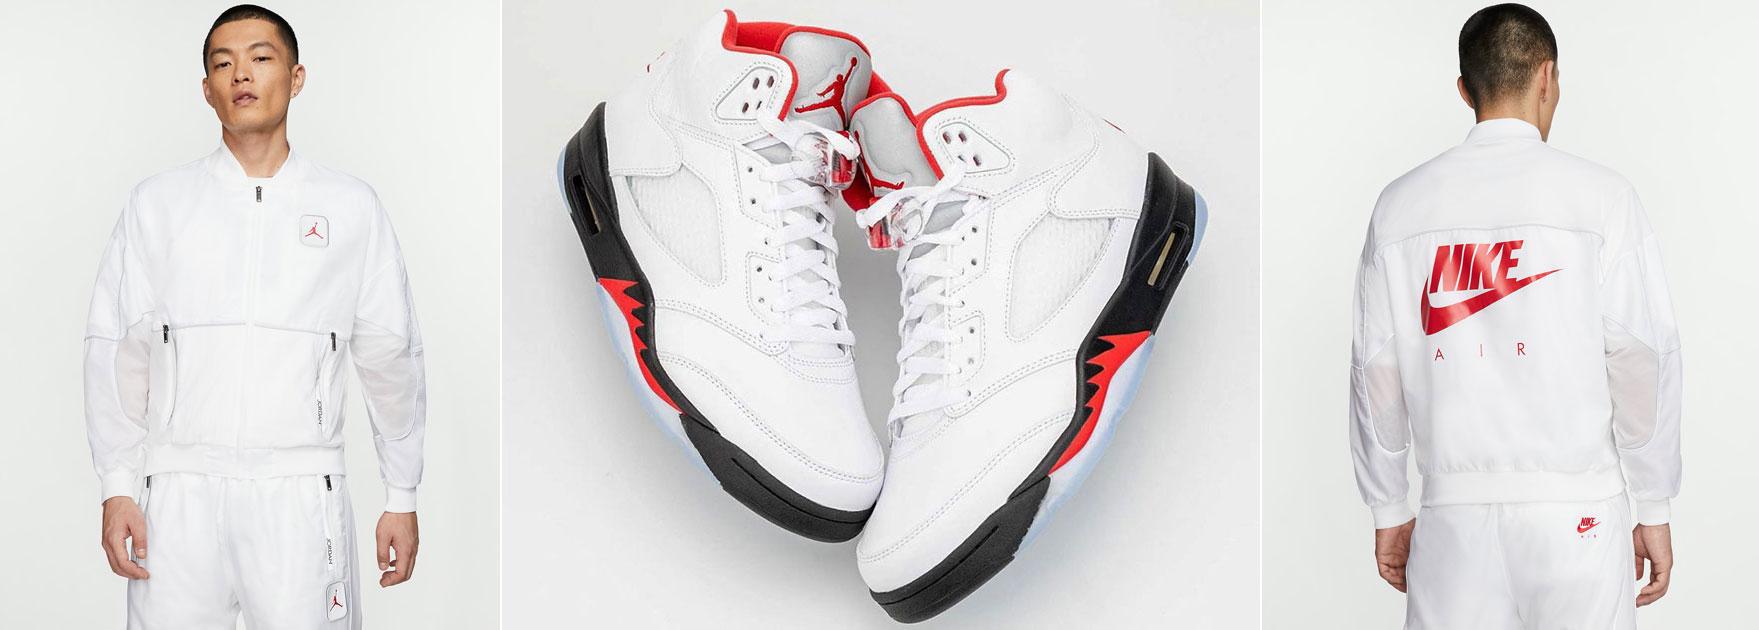 air-jordan-5-white-fire-red-2020-jacket